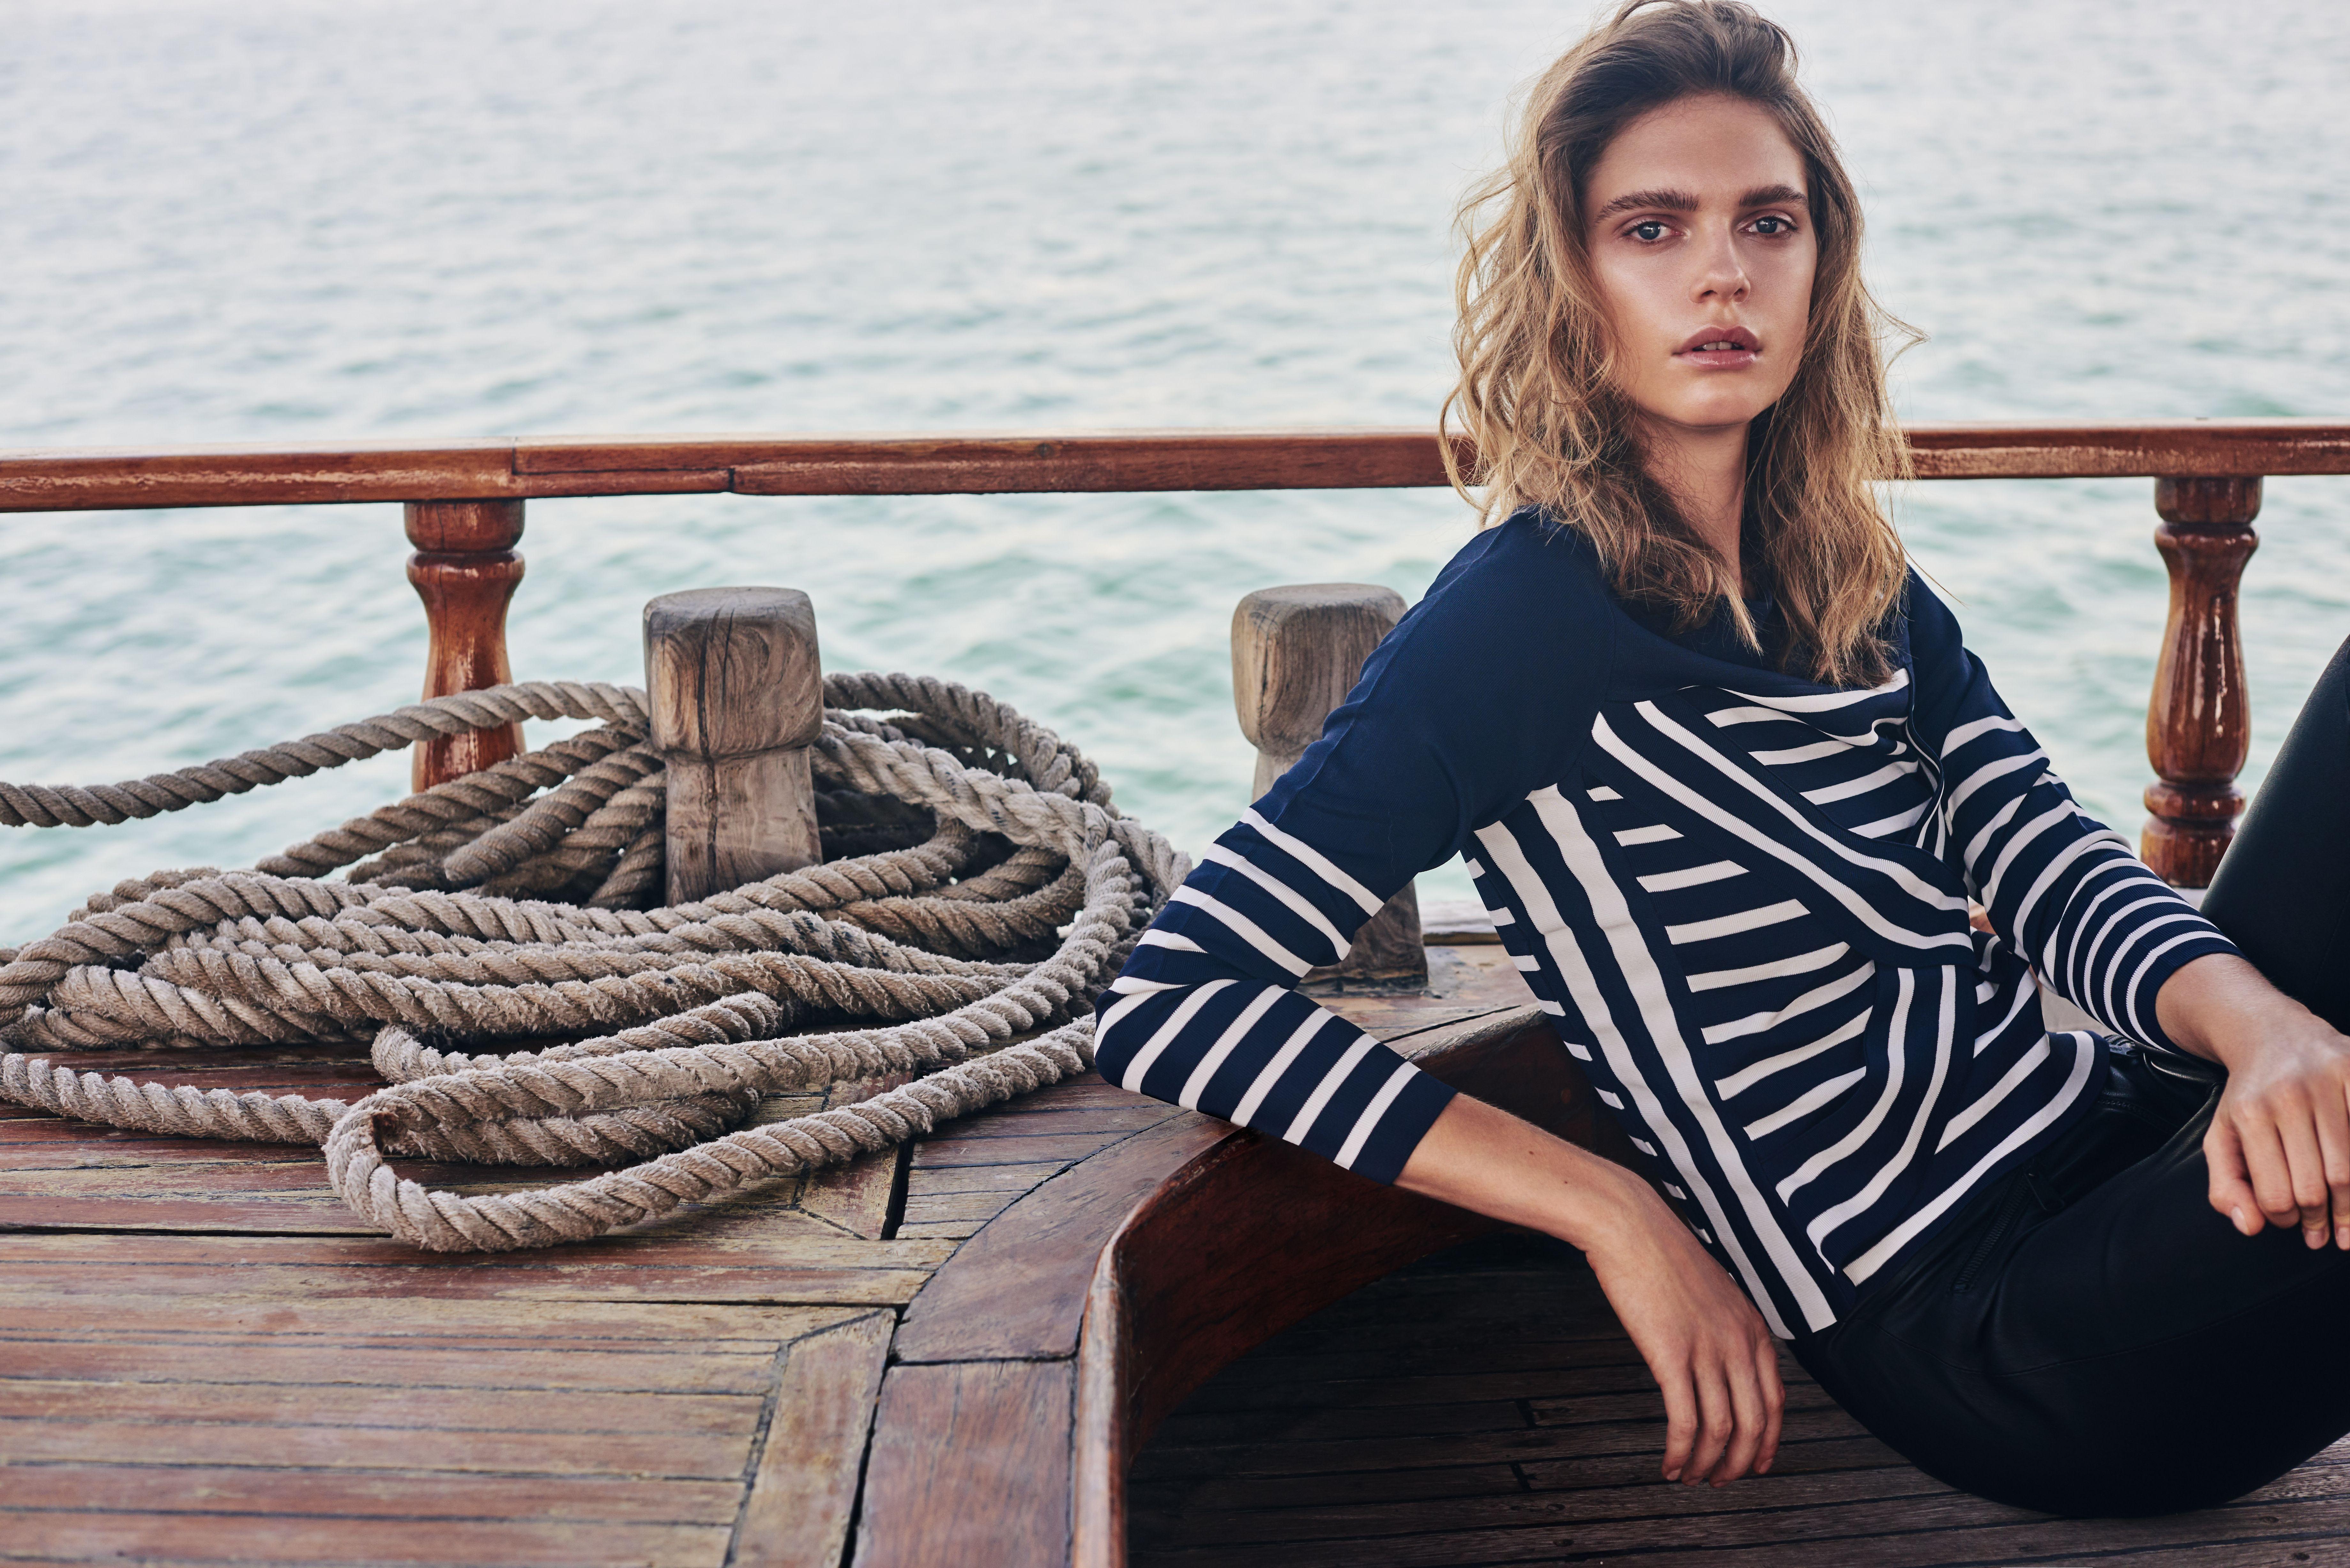 Sail Away With Me: Tommy Hilfiger x Gigi Hadid